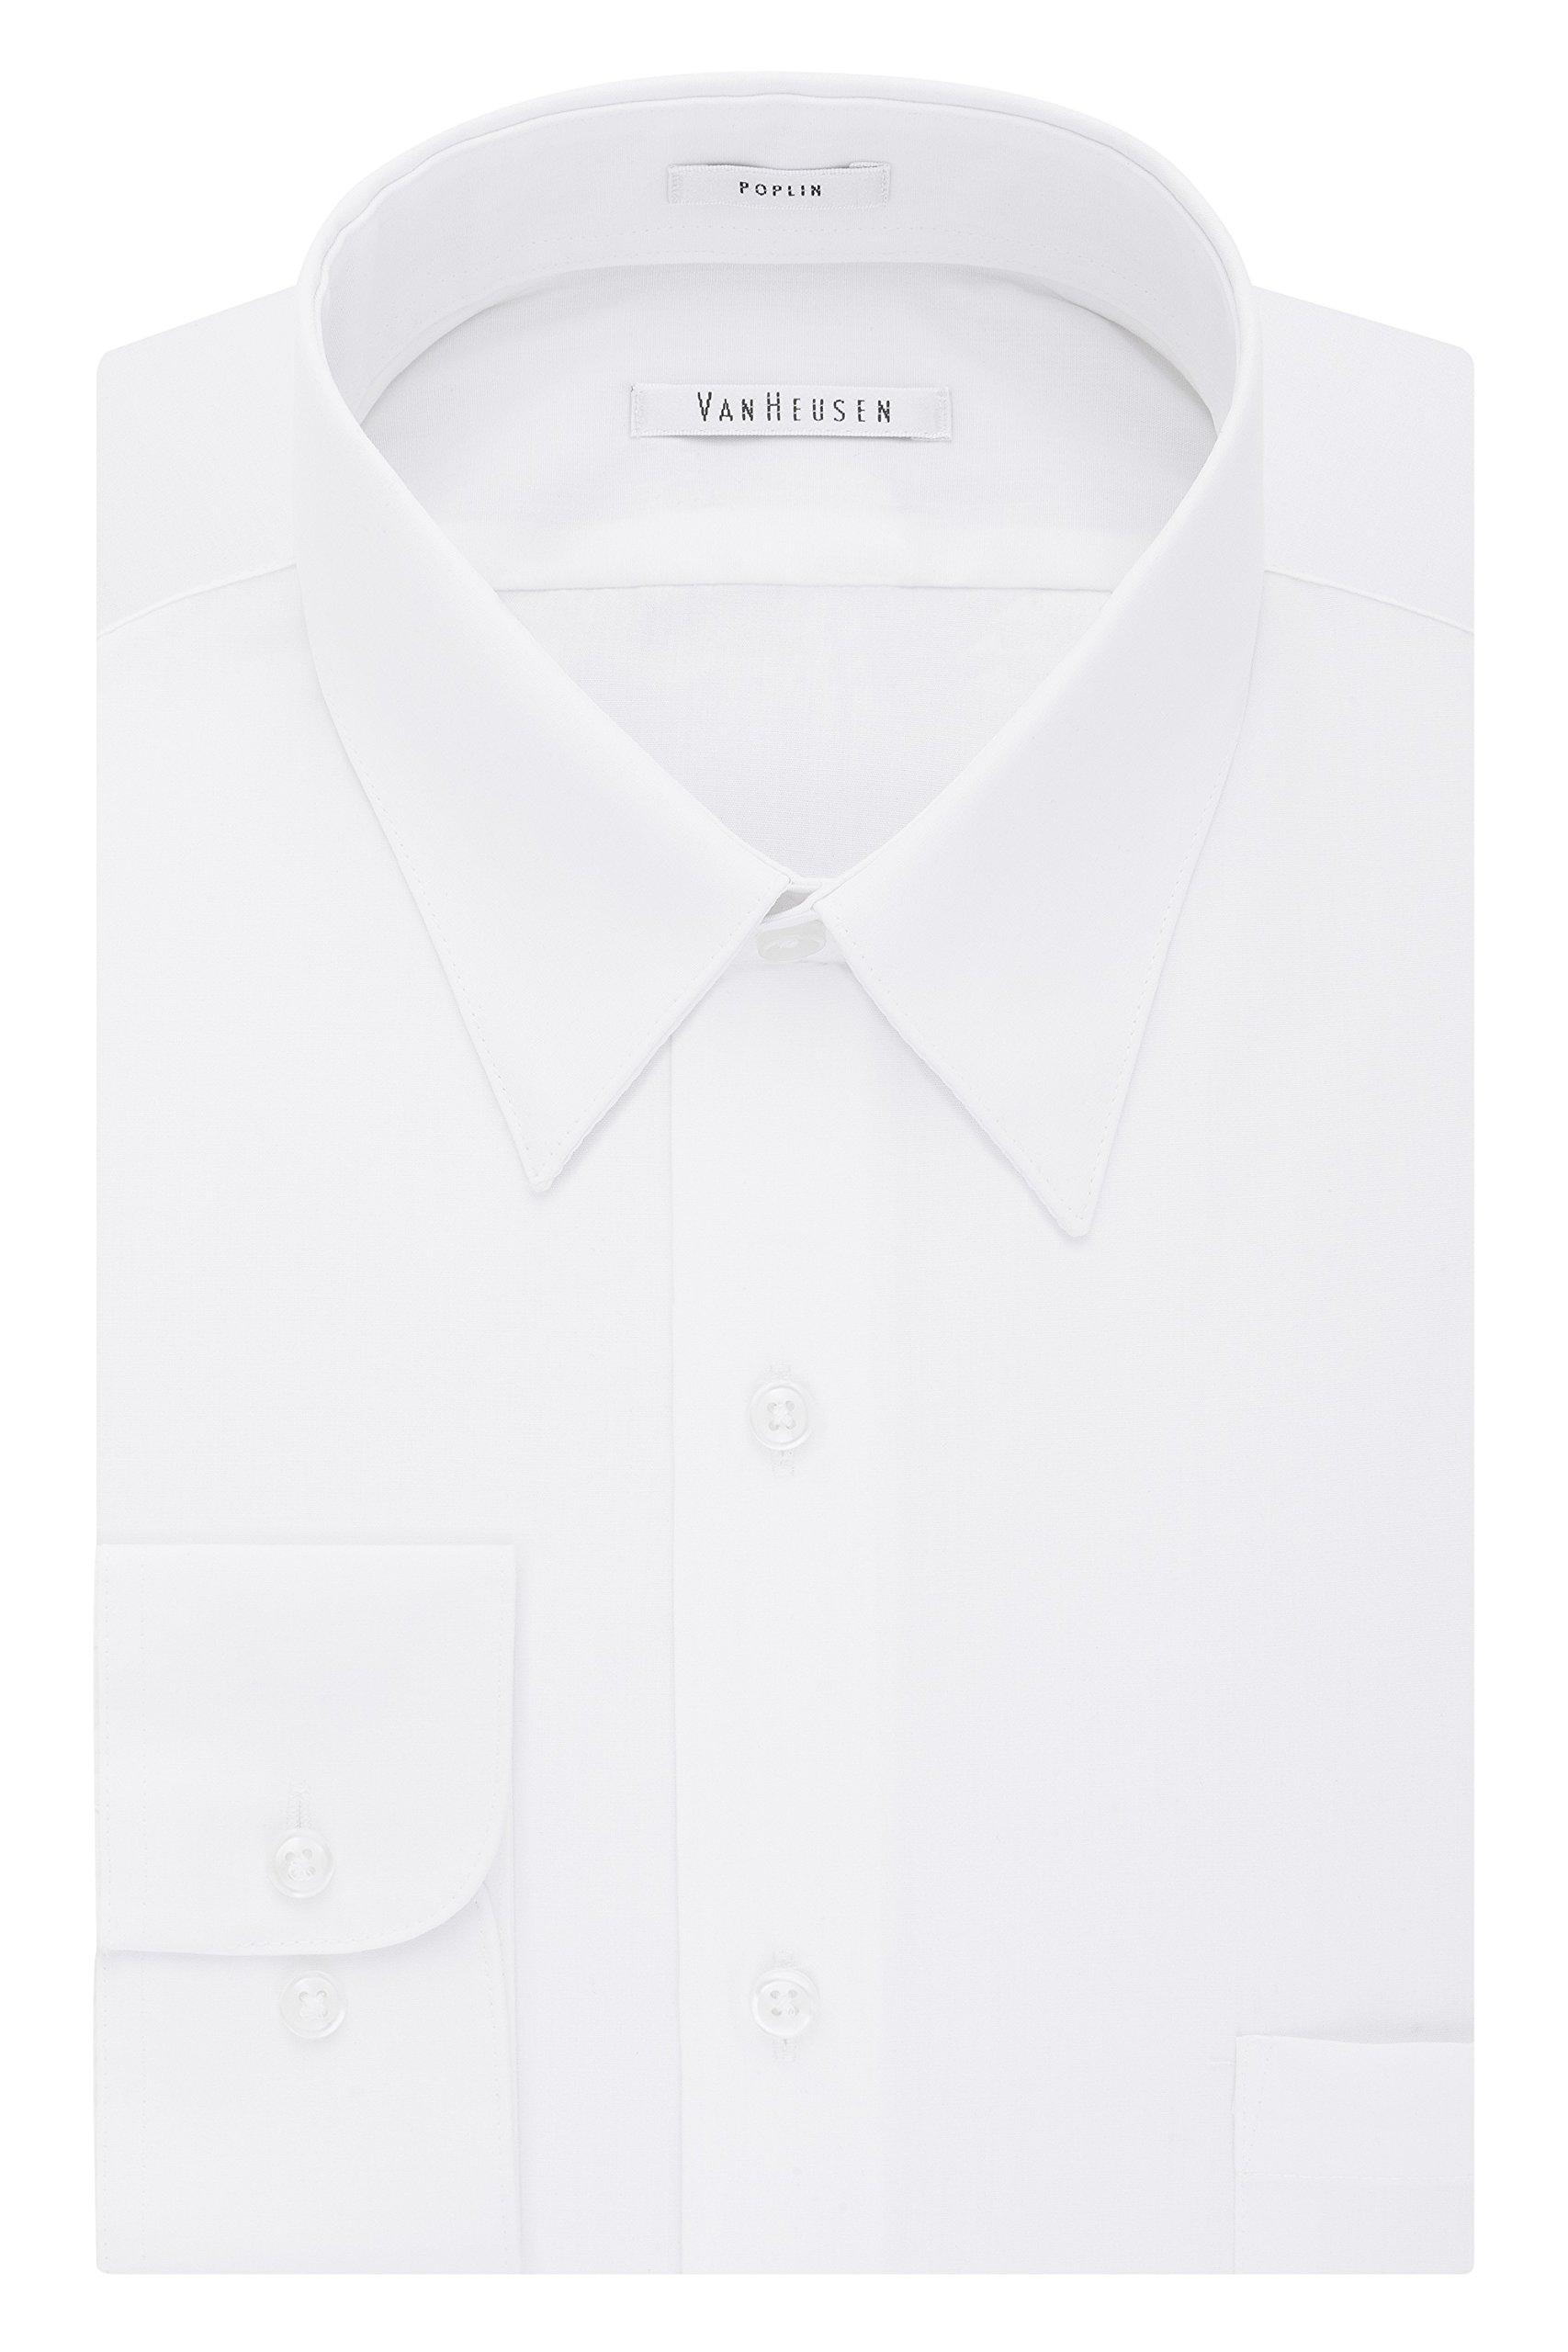 Van Heusen Men's Poplin Regular Fit Solid Point Collar Dress Shirt, White, 17'' Neck 34''-35'' Sleeve